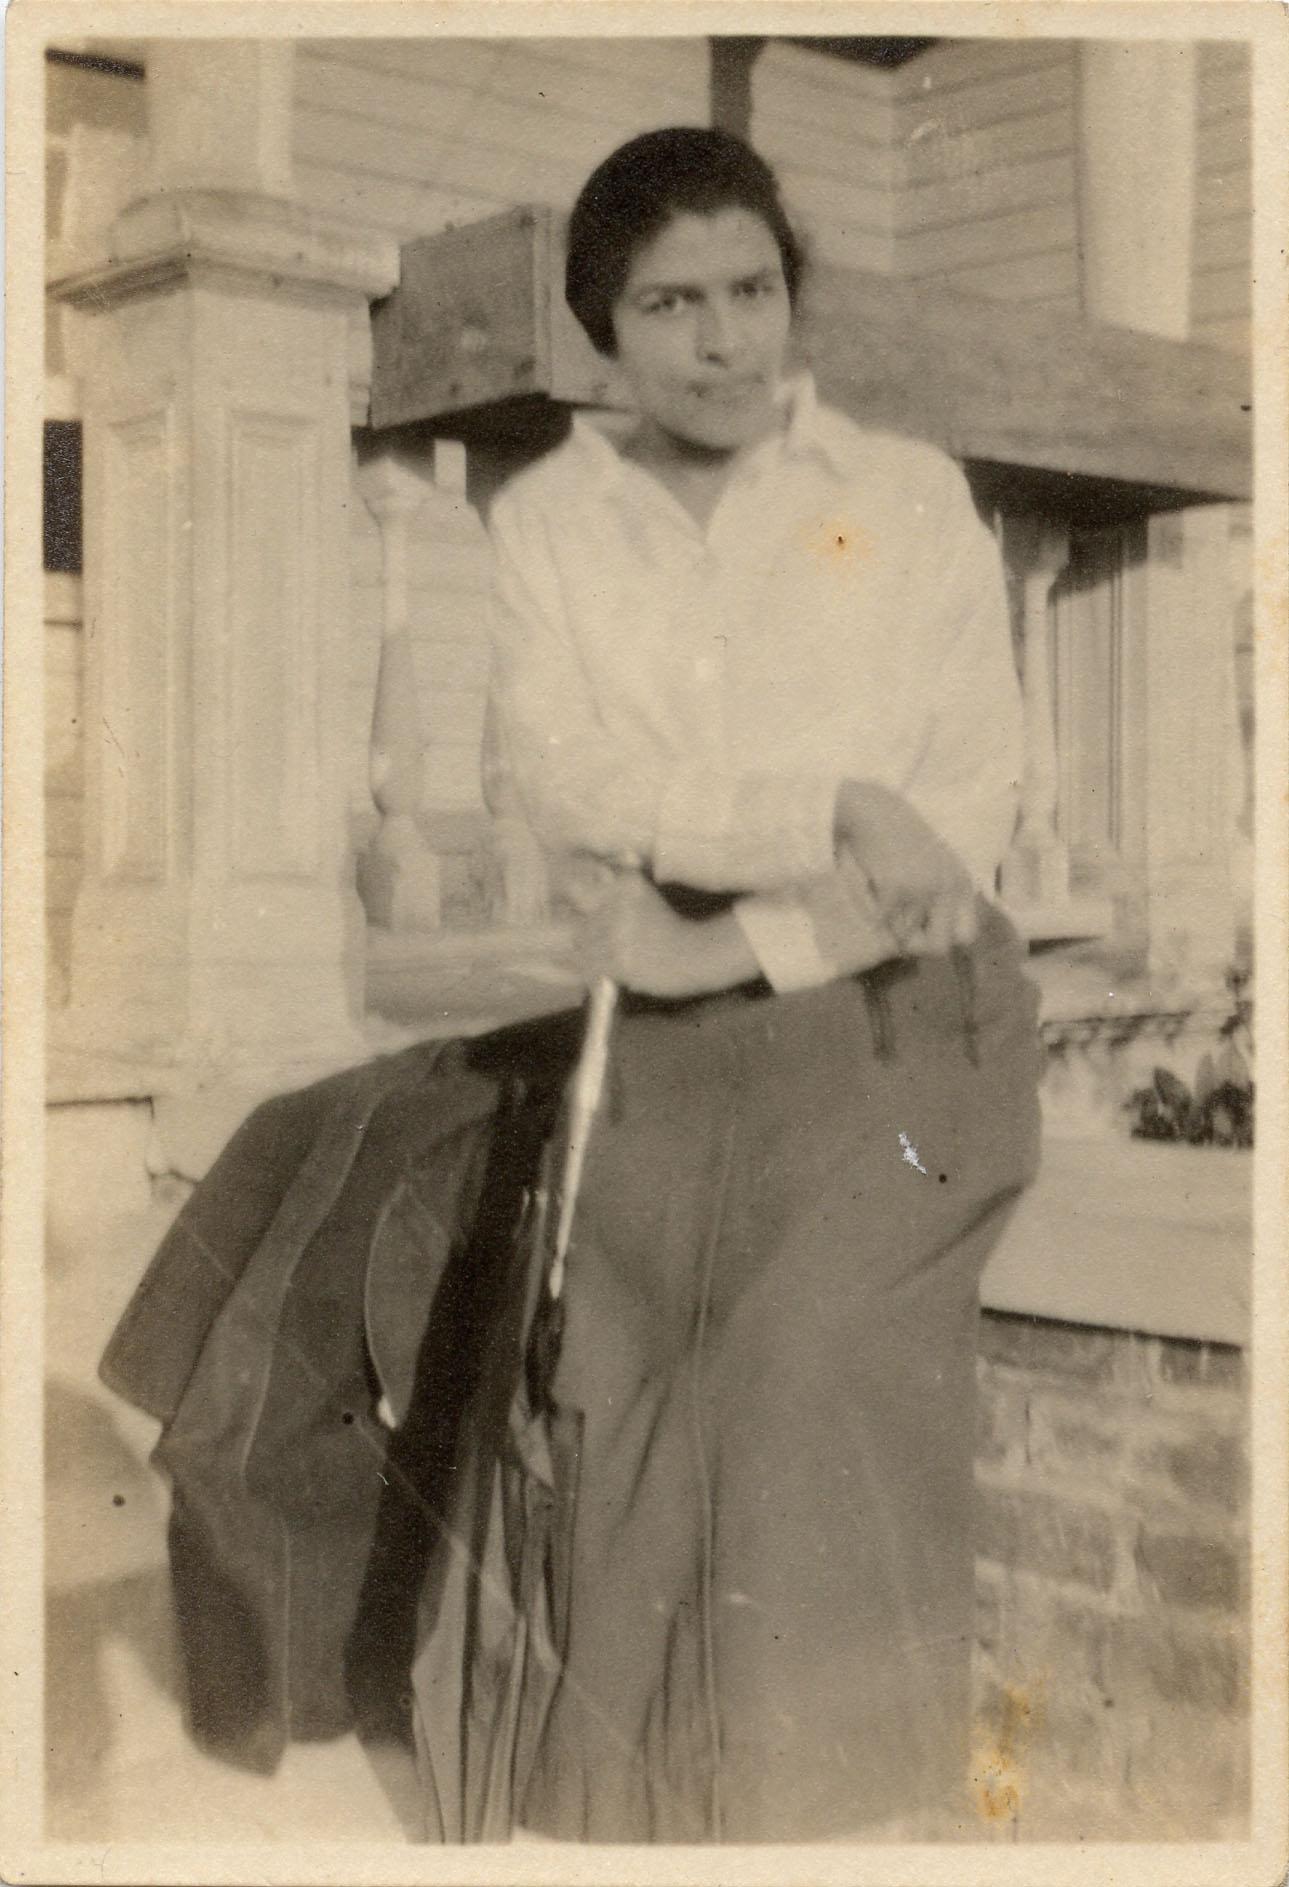 Miriam DeCosta Seabrook seated on porch